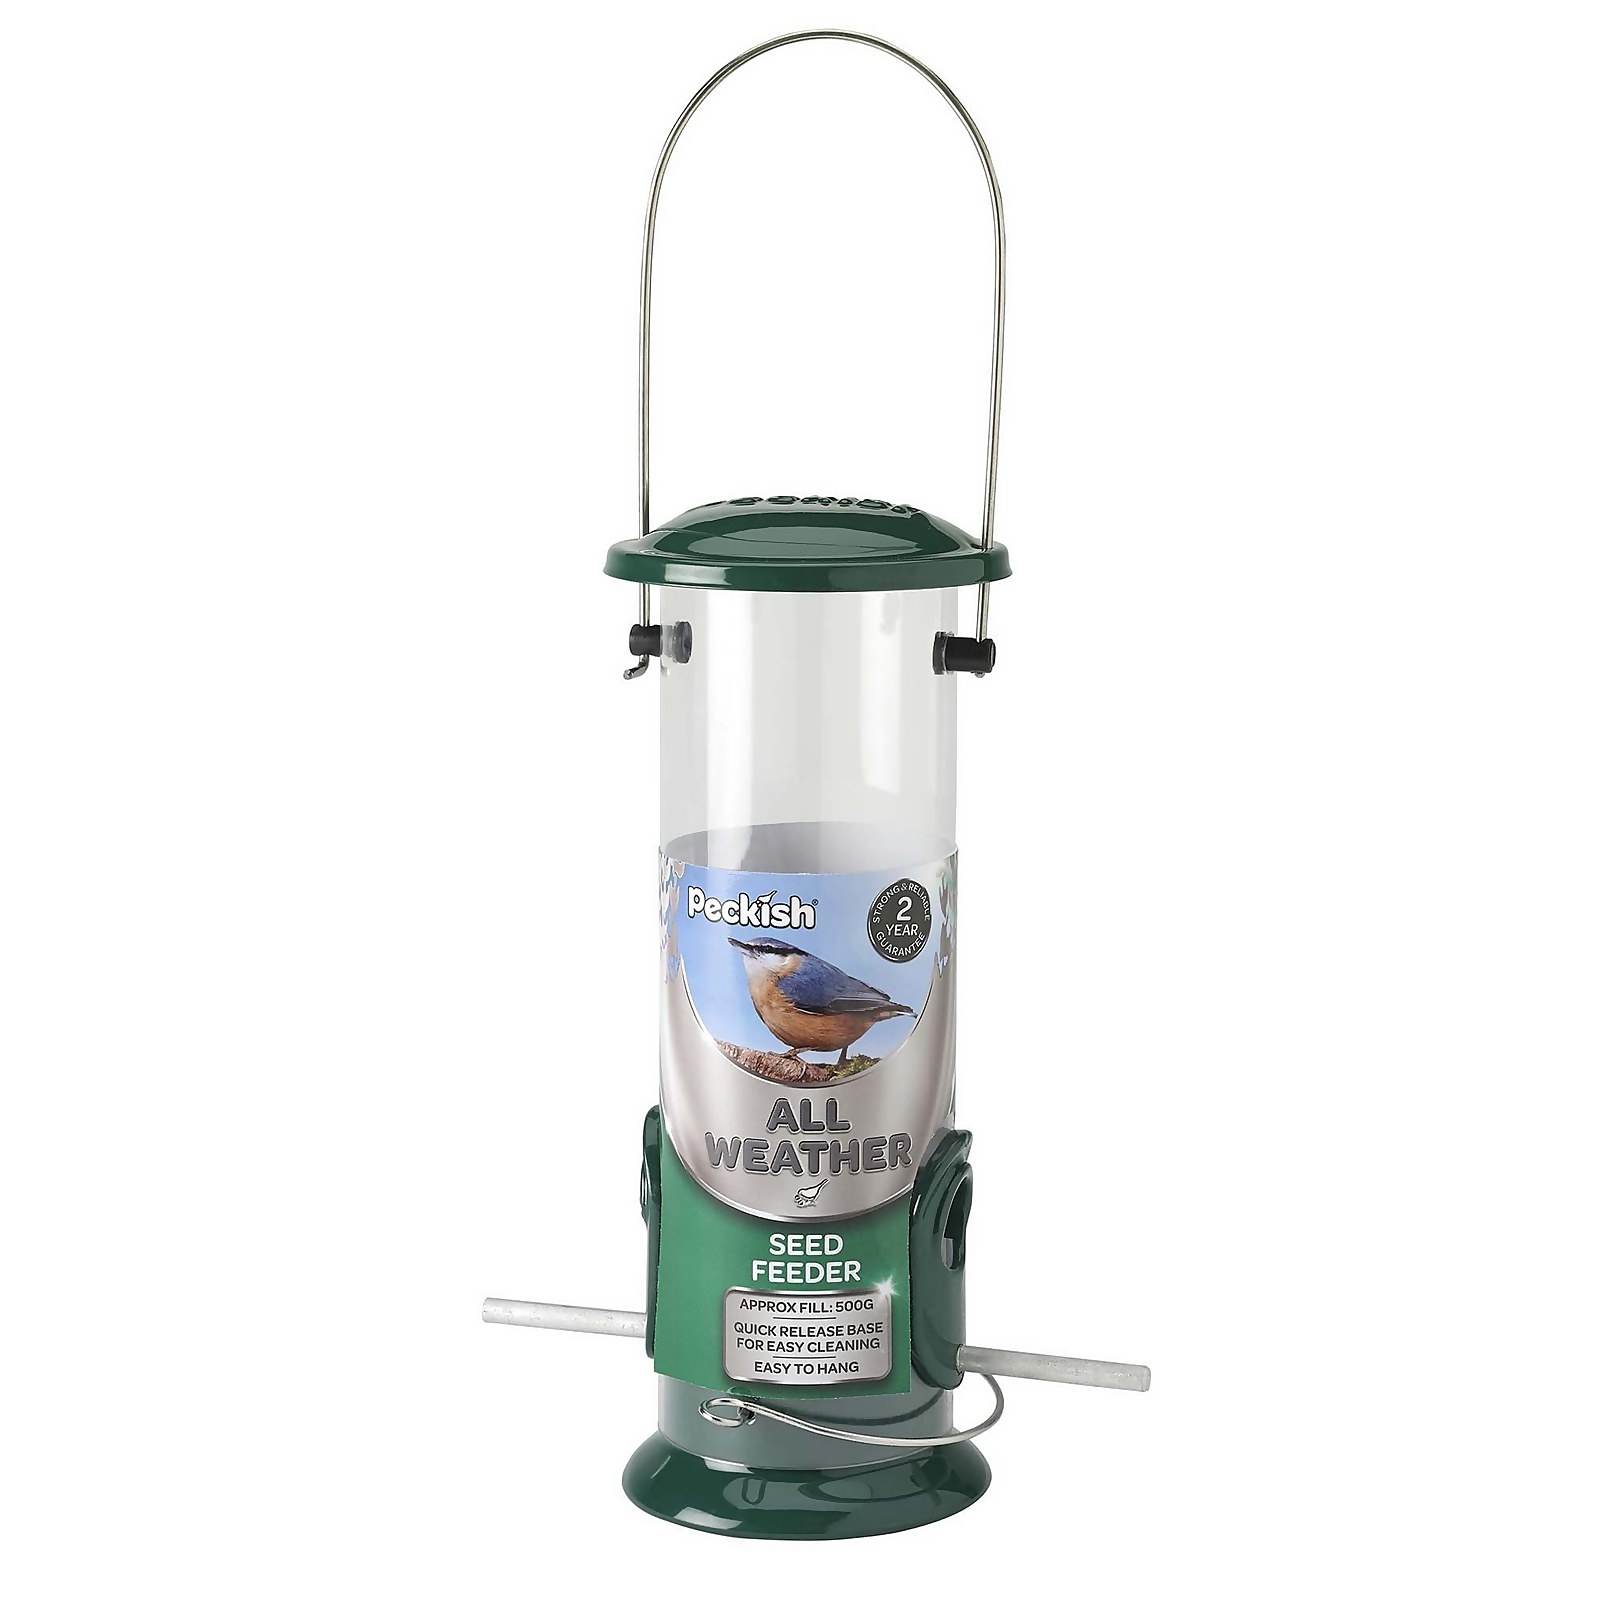 Peckish All Weather 3 Wild Bird Seed Feeder - Green